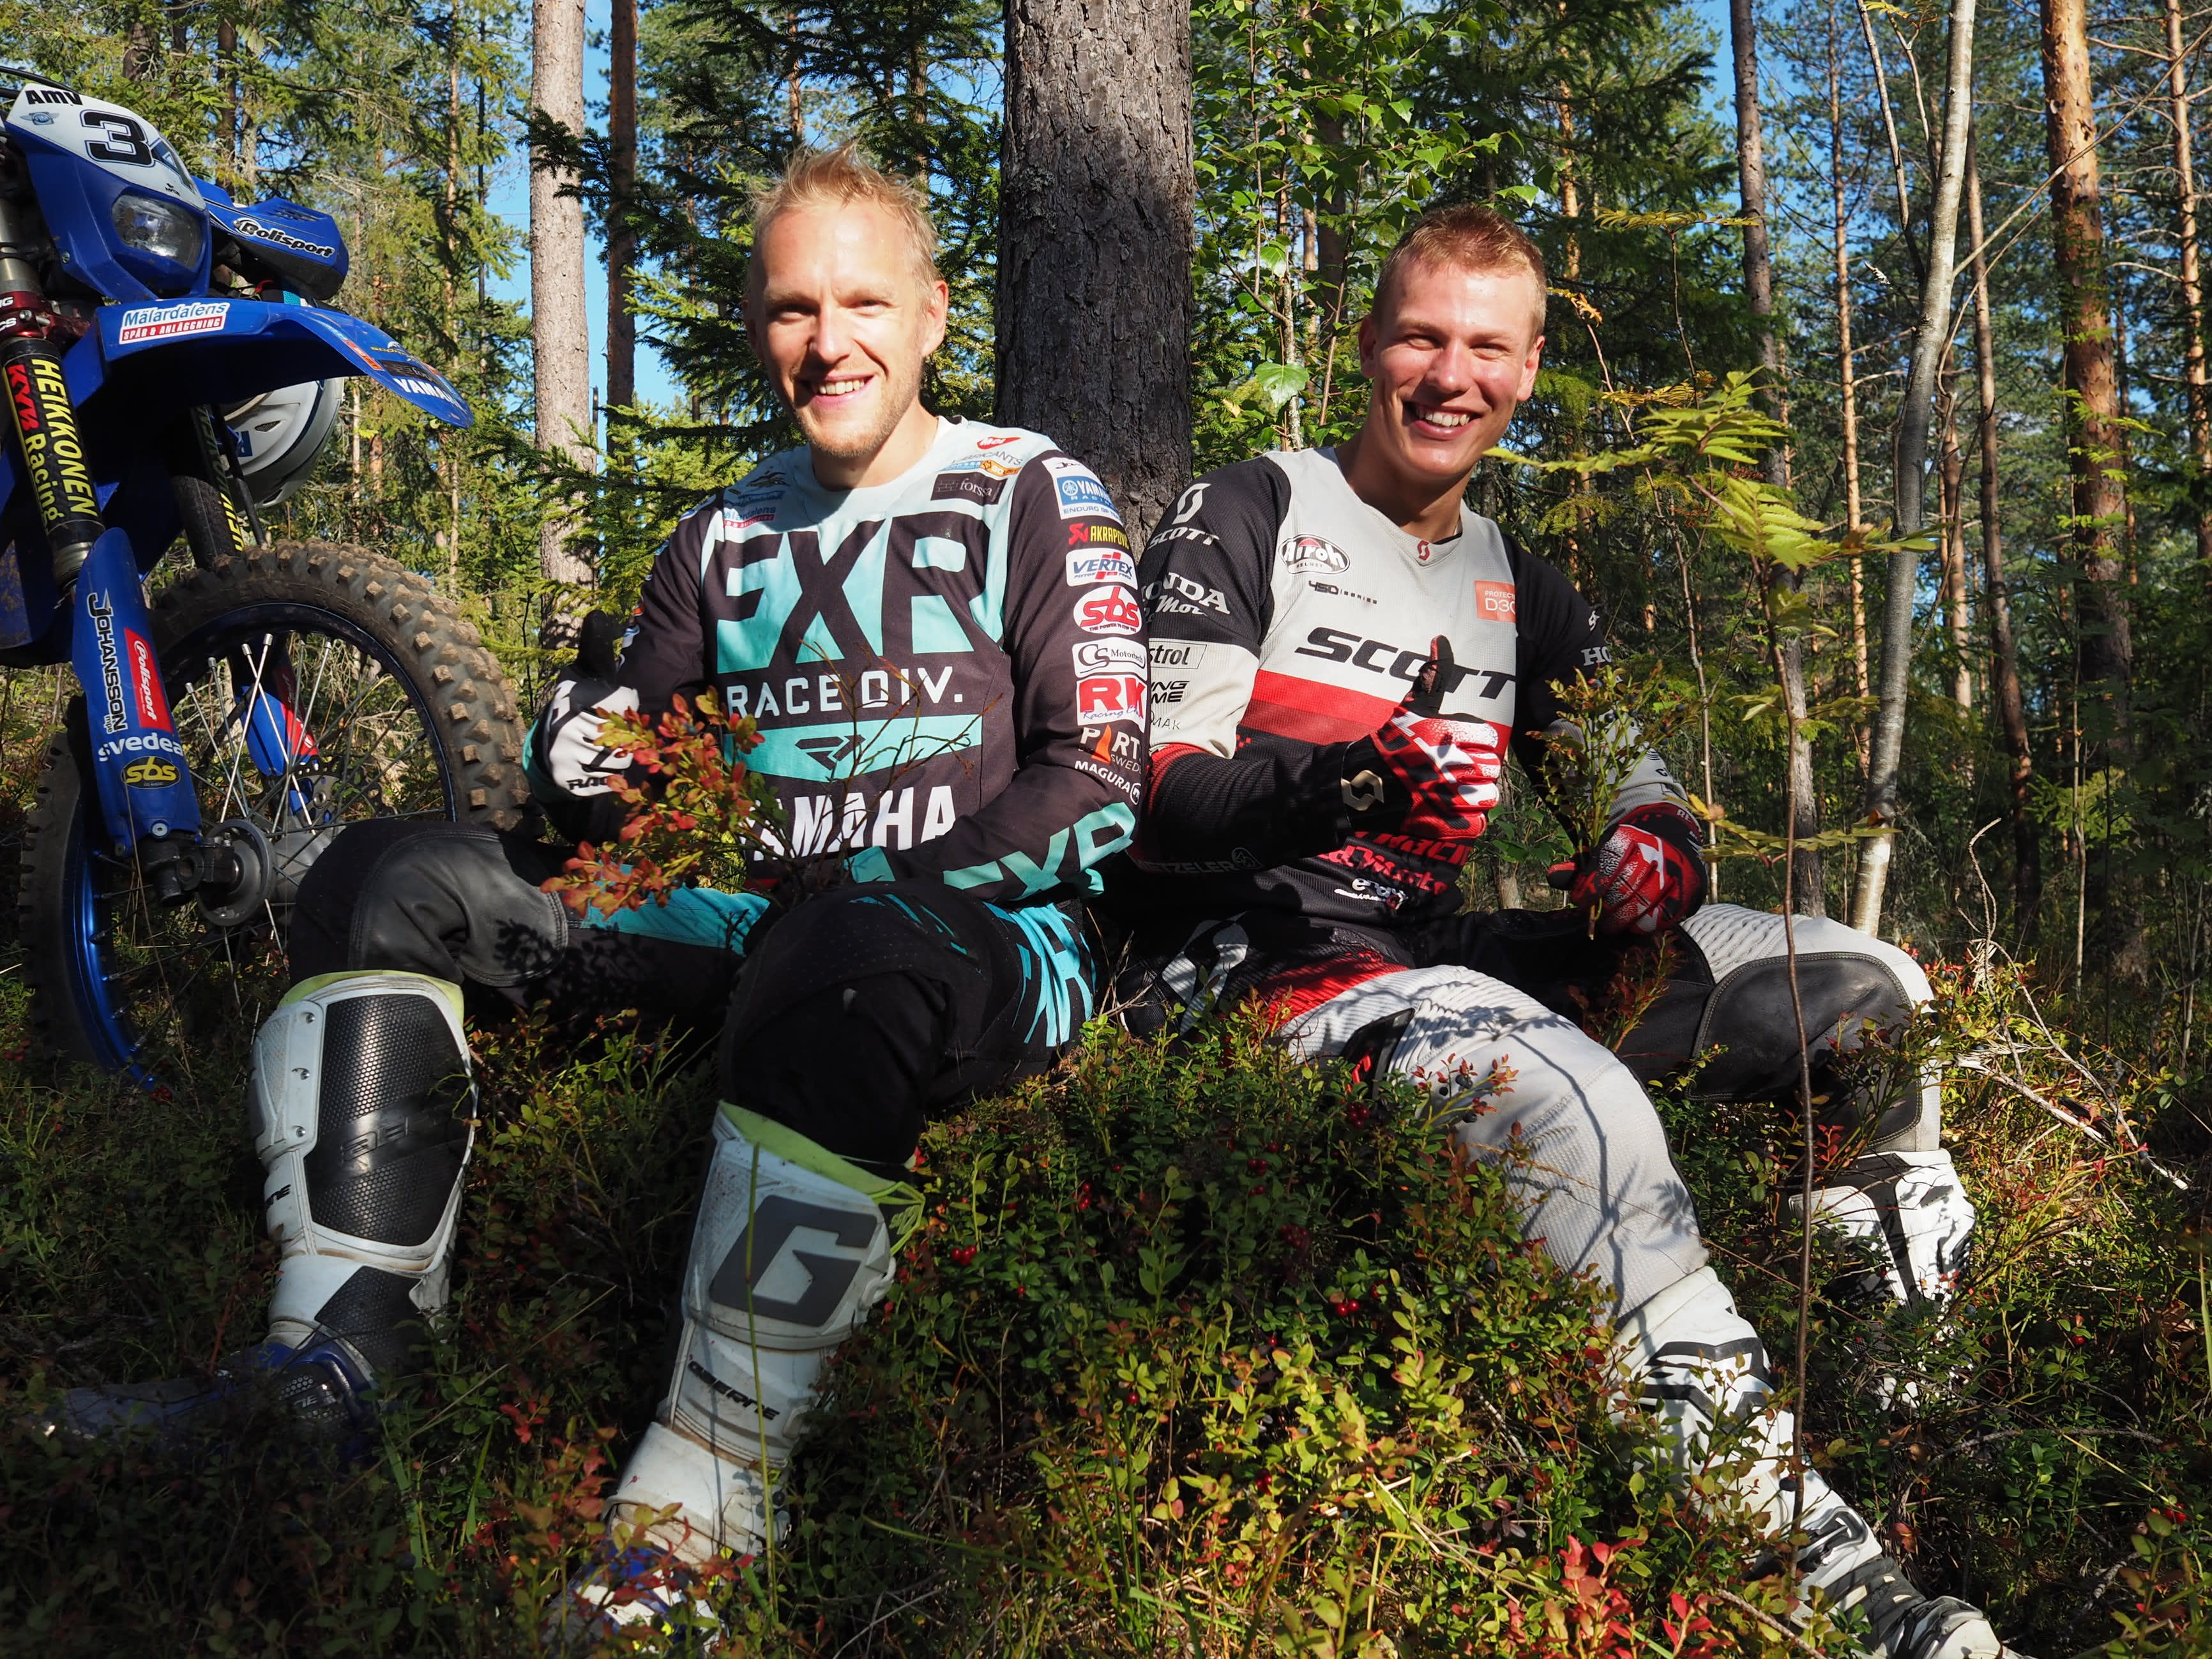 Enduro Roni Kytönen (vas.) ja Eero Remes mustikkahetki